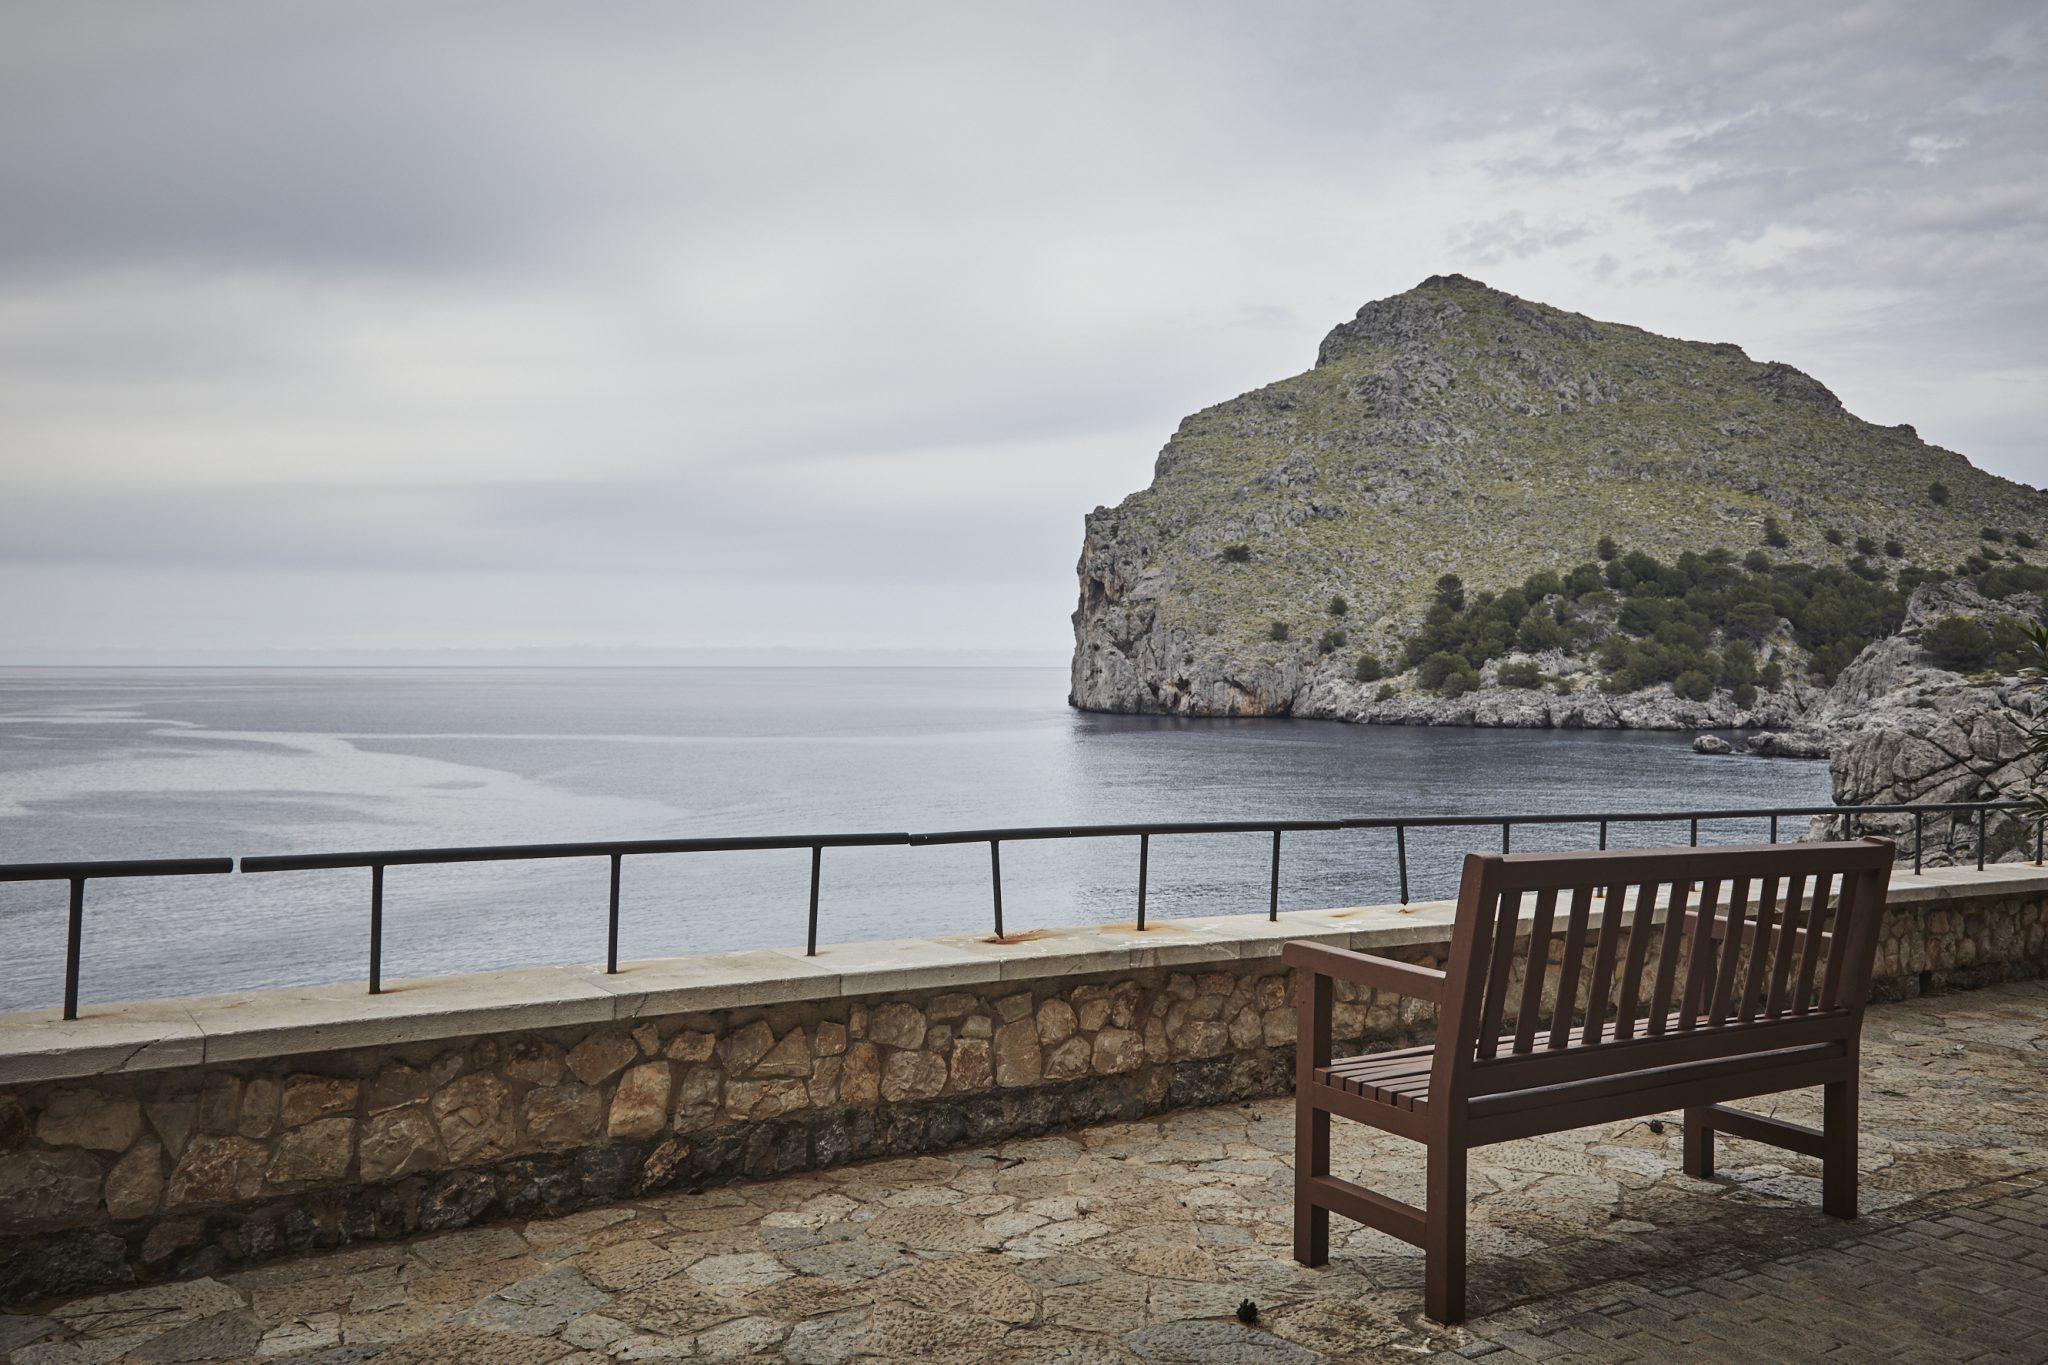 15_RifSpahni_Mallorca Covid_20_A2A0241